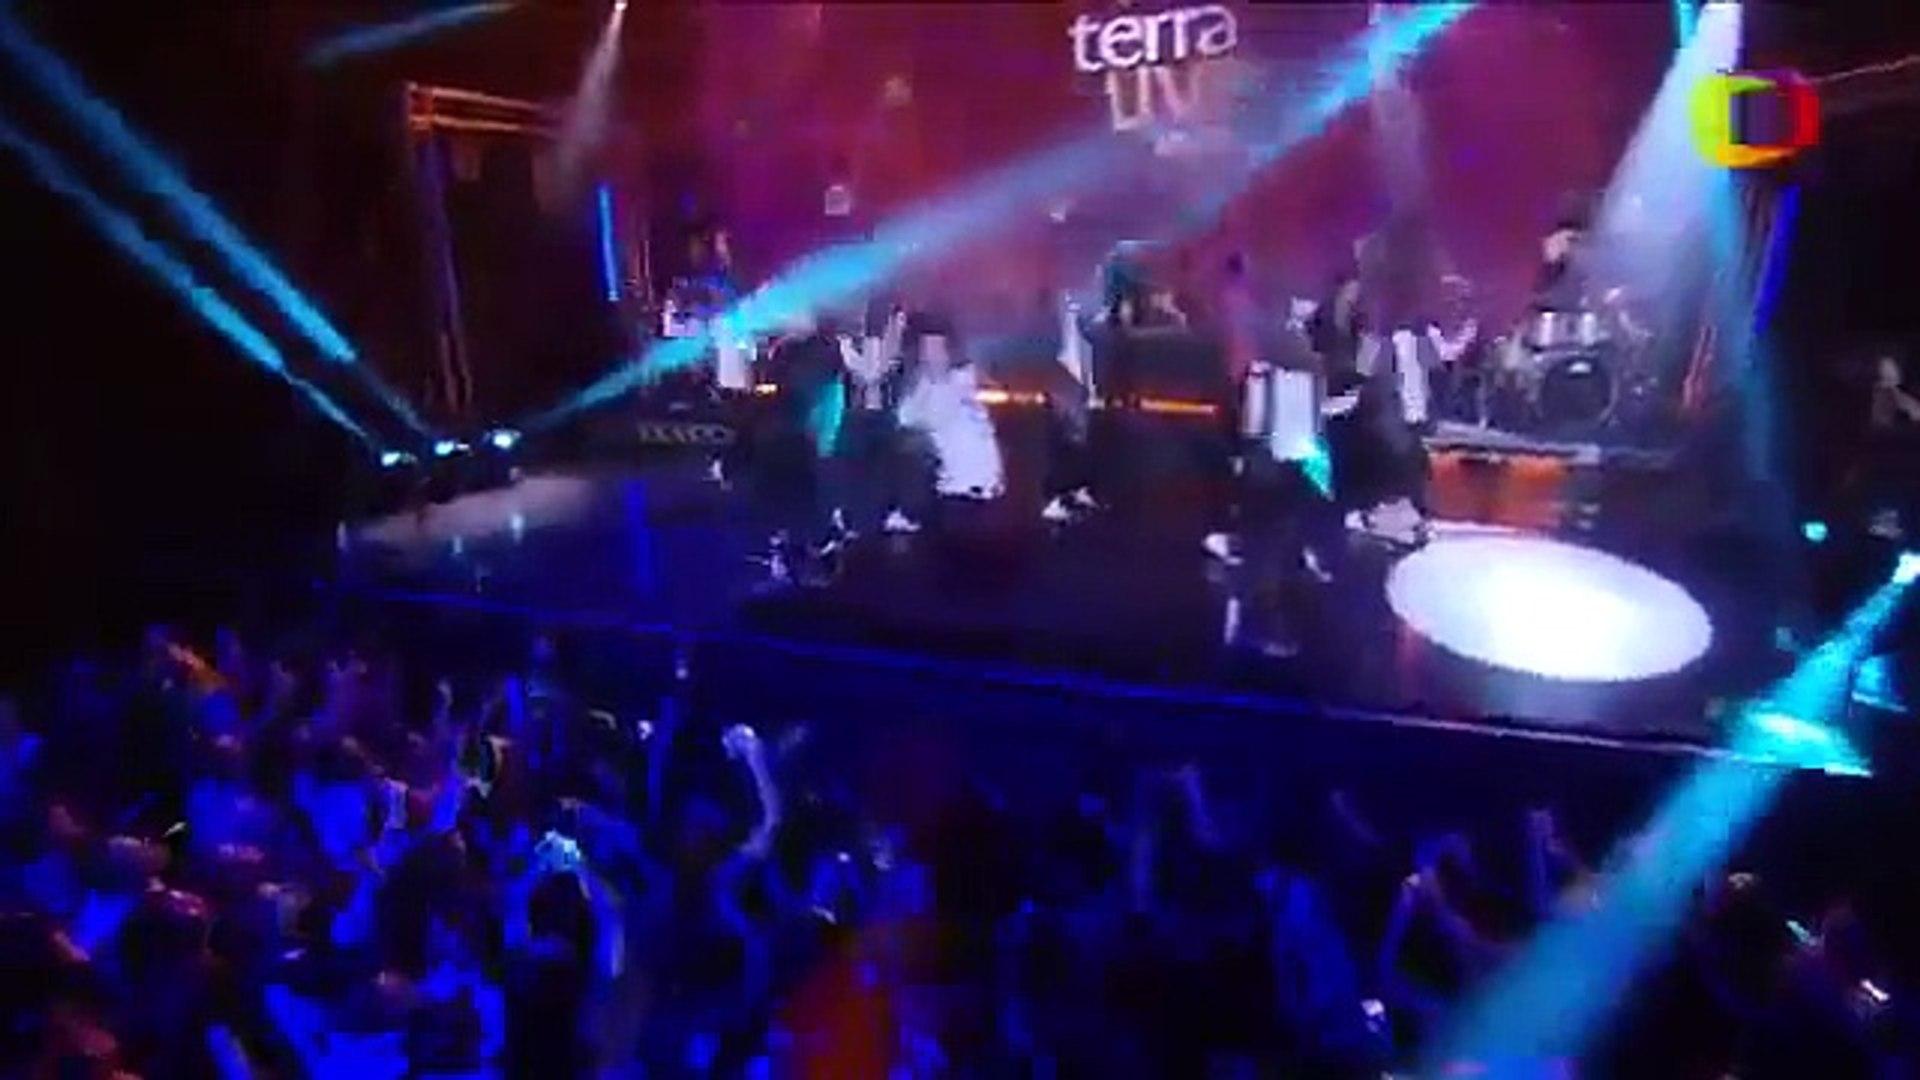 J Balvin en concierto '6am' Feat Farruko - Terra Live Music